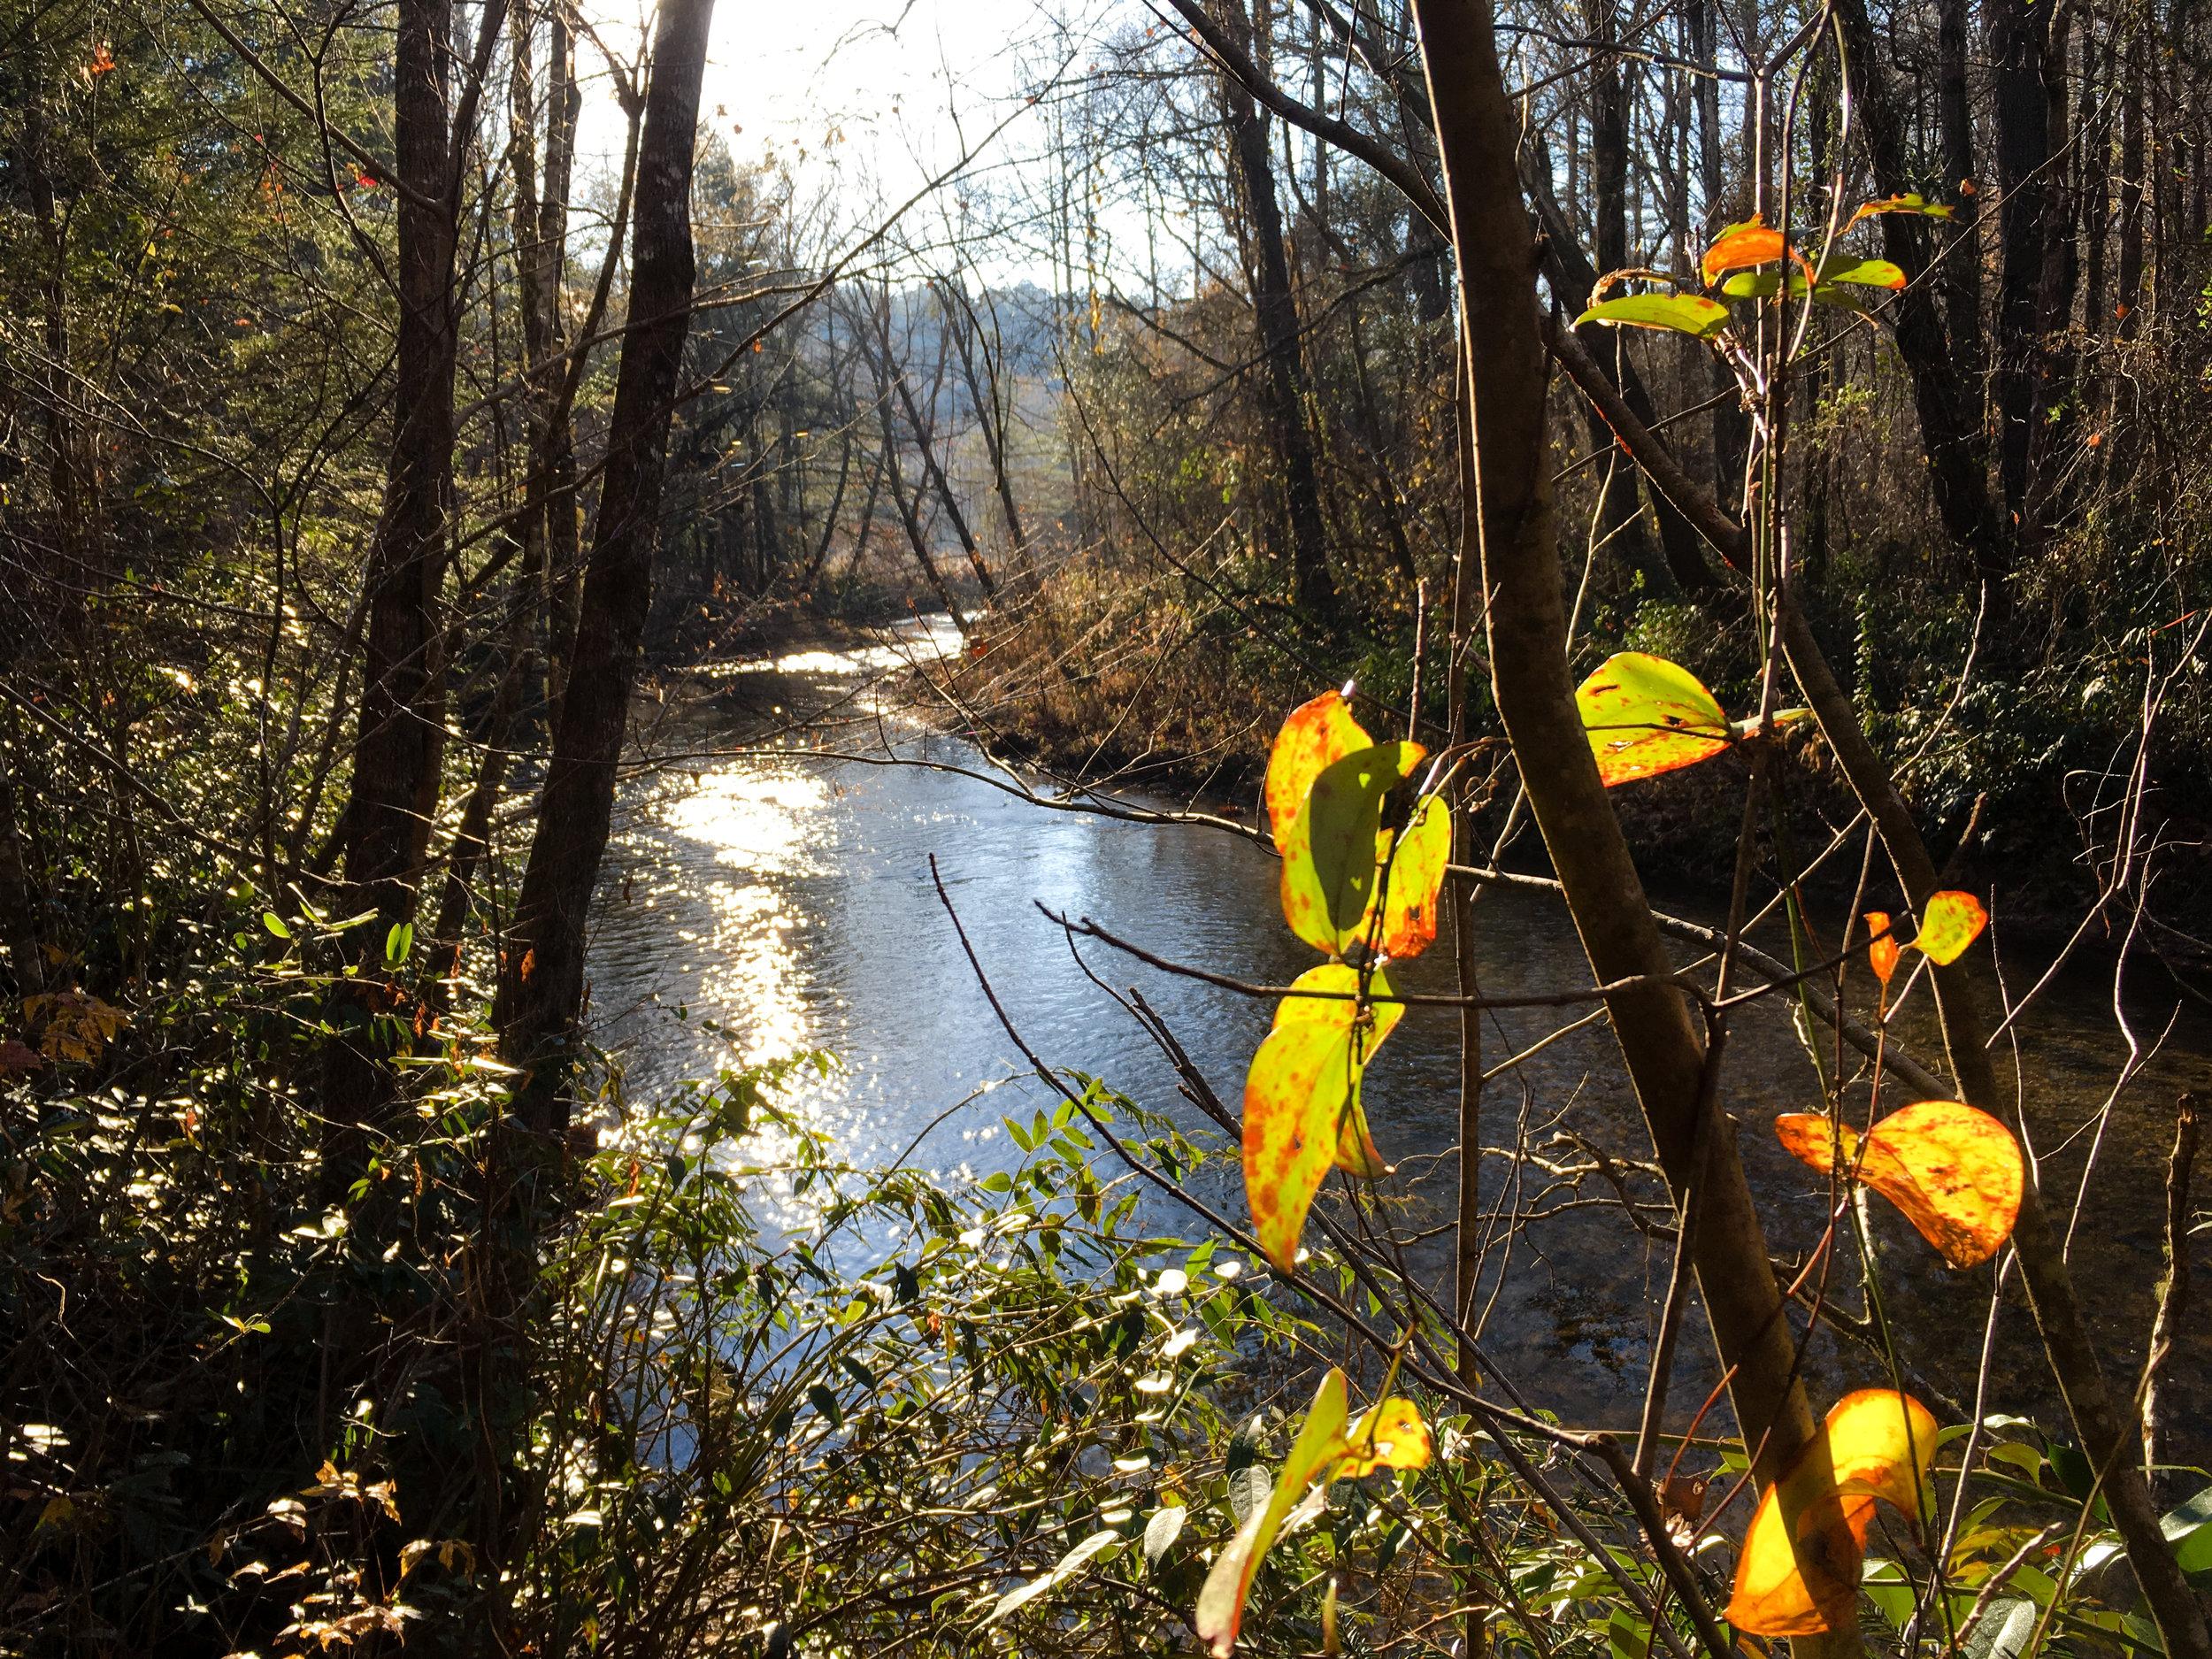 Dukes Creek, November 24, 2017